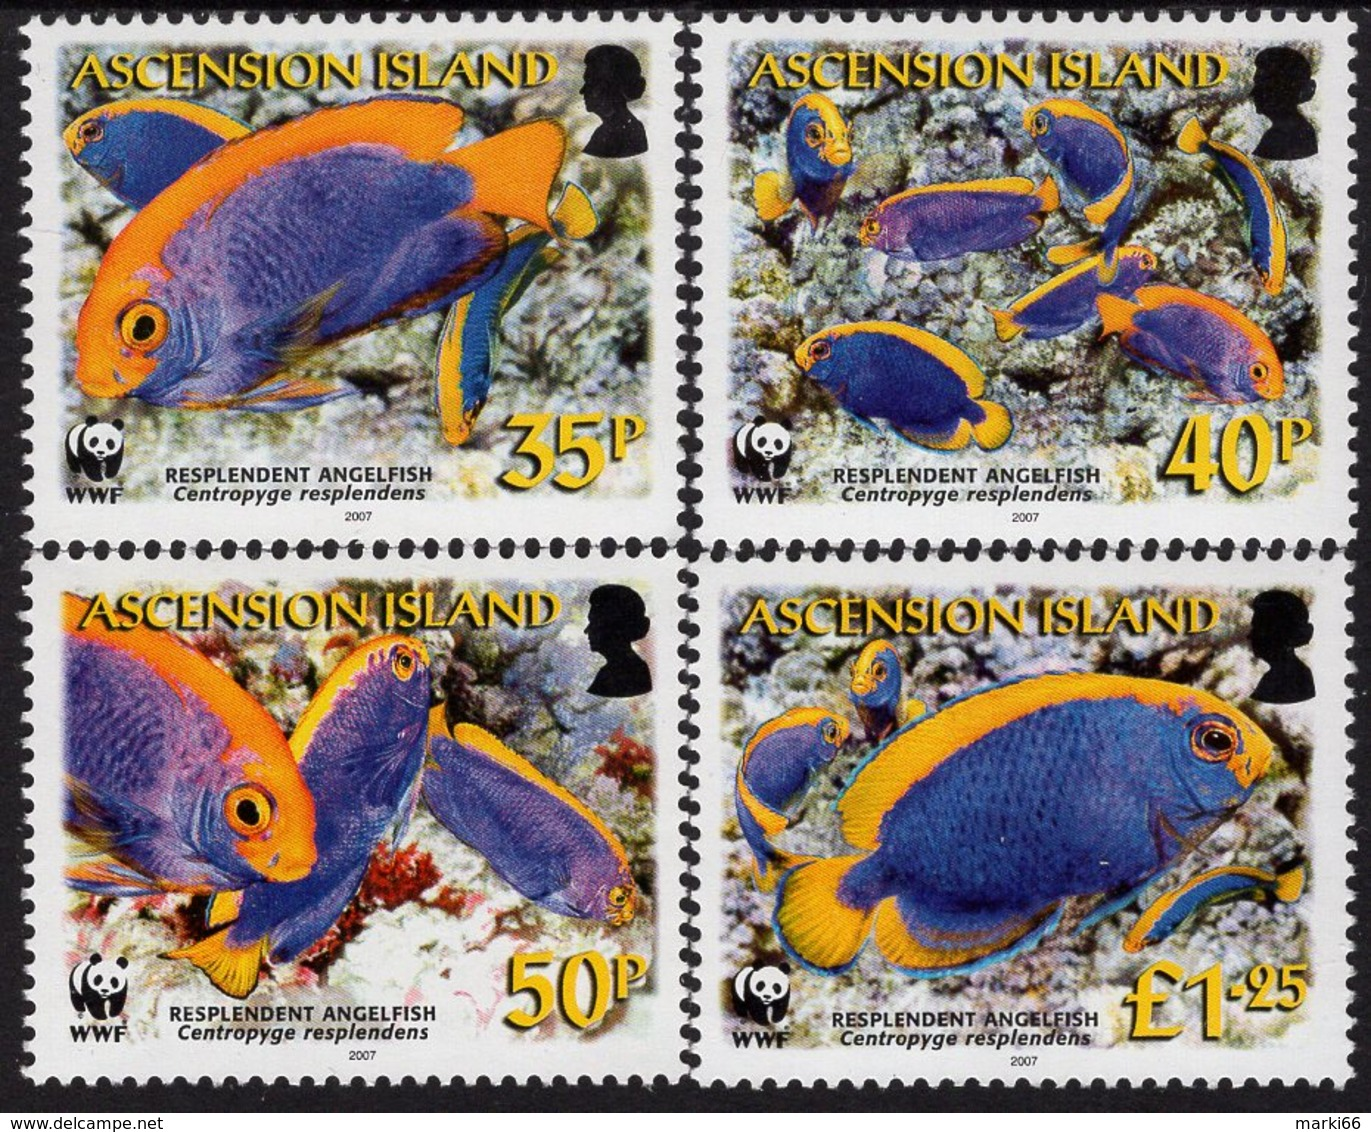 Ascension Island - 2007 - WWF - Resplendent Angelfish - Mint Stamp Set - Ascension (Ile De L')